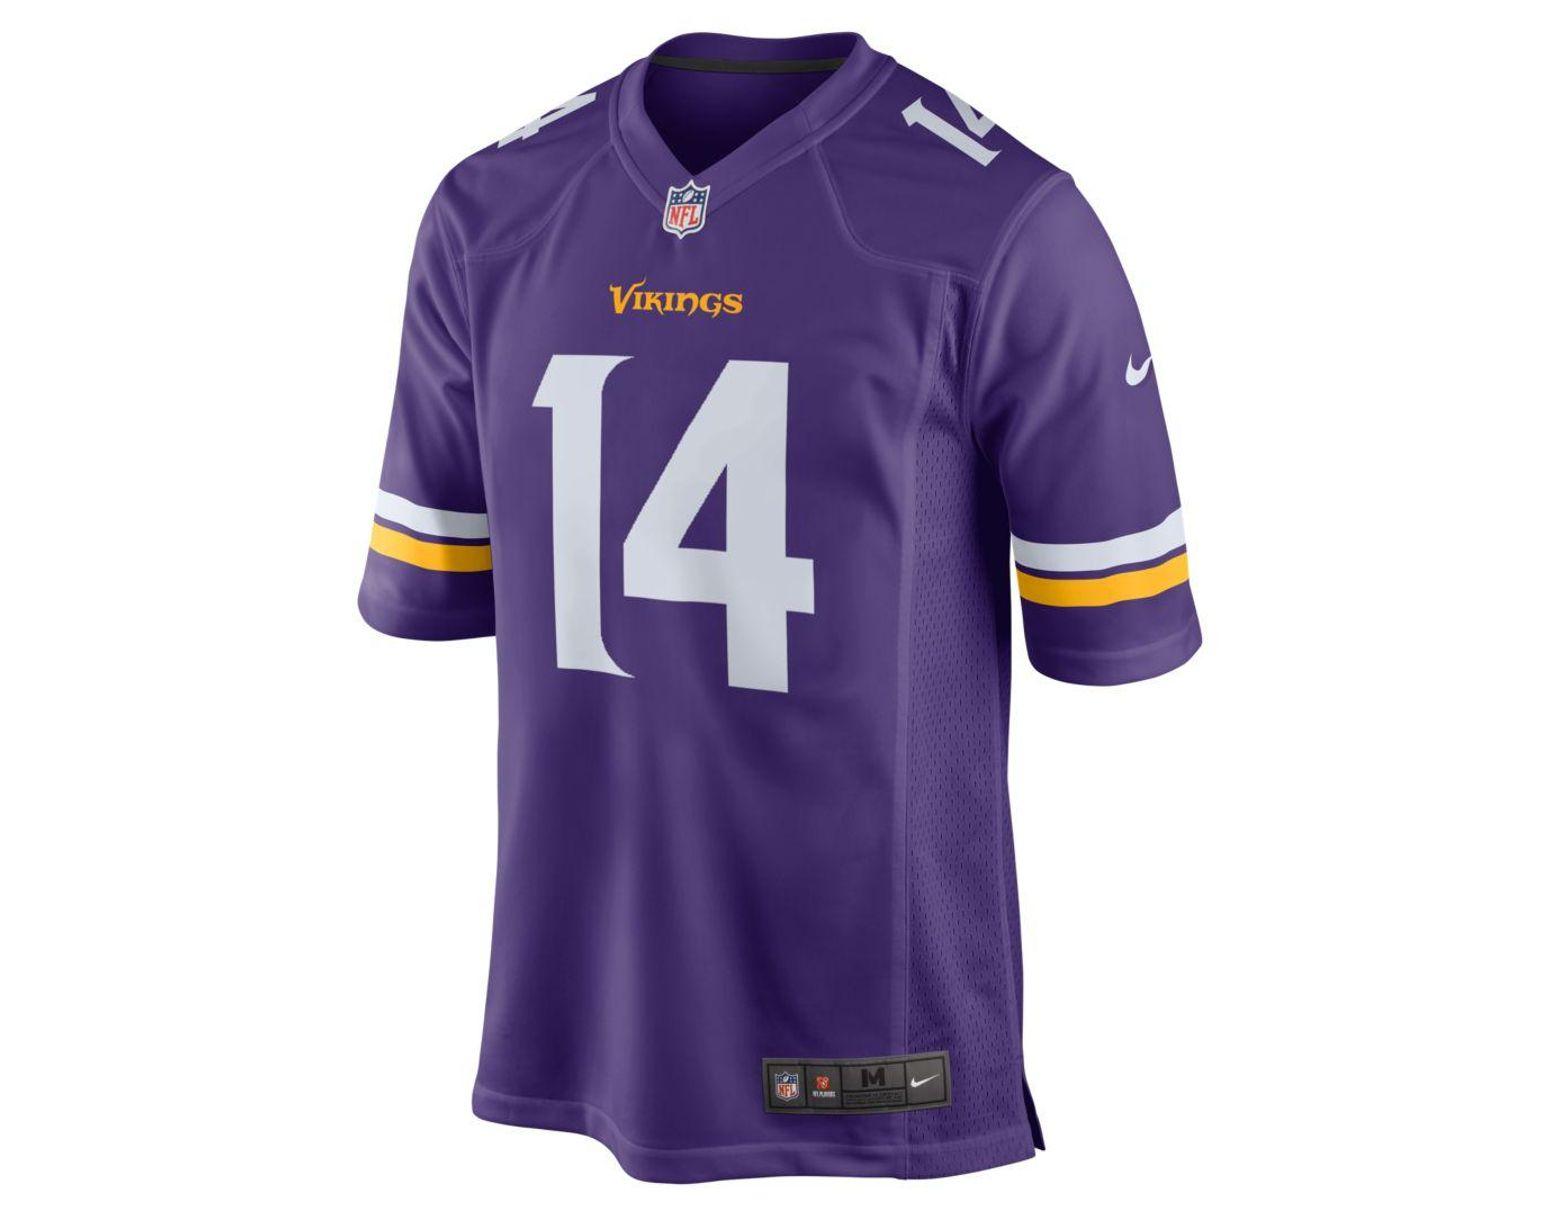 separation shoes e5cd2 0aa0b Men's Purple Nfl Minnesota Vikings (stefon Diggs) Game Football Jersey